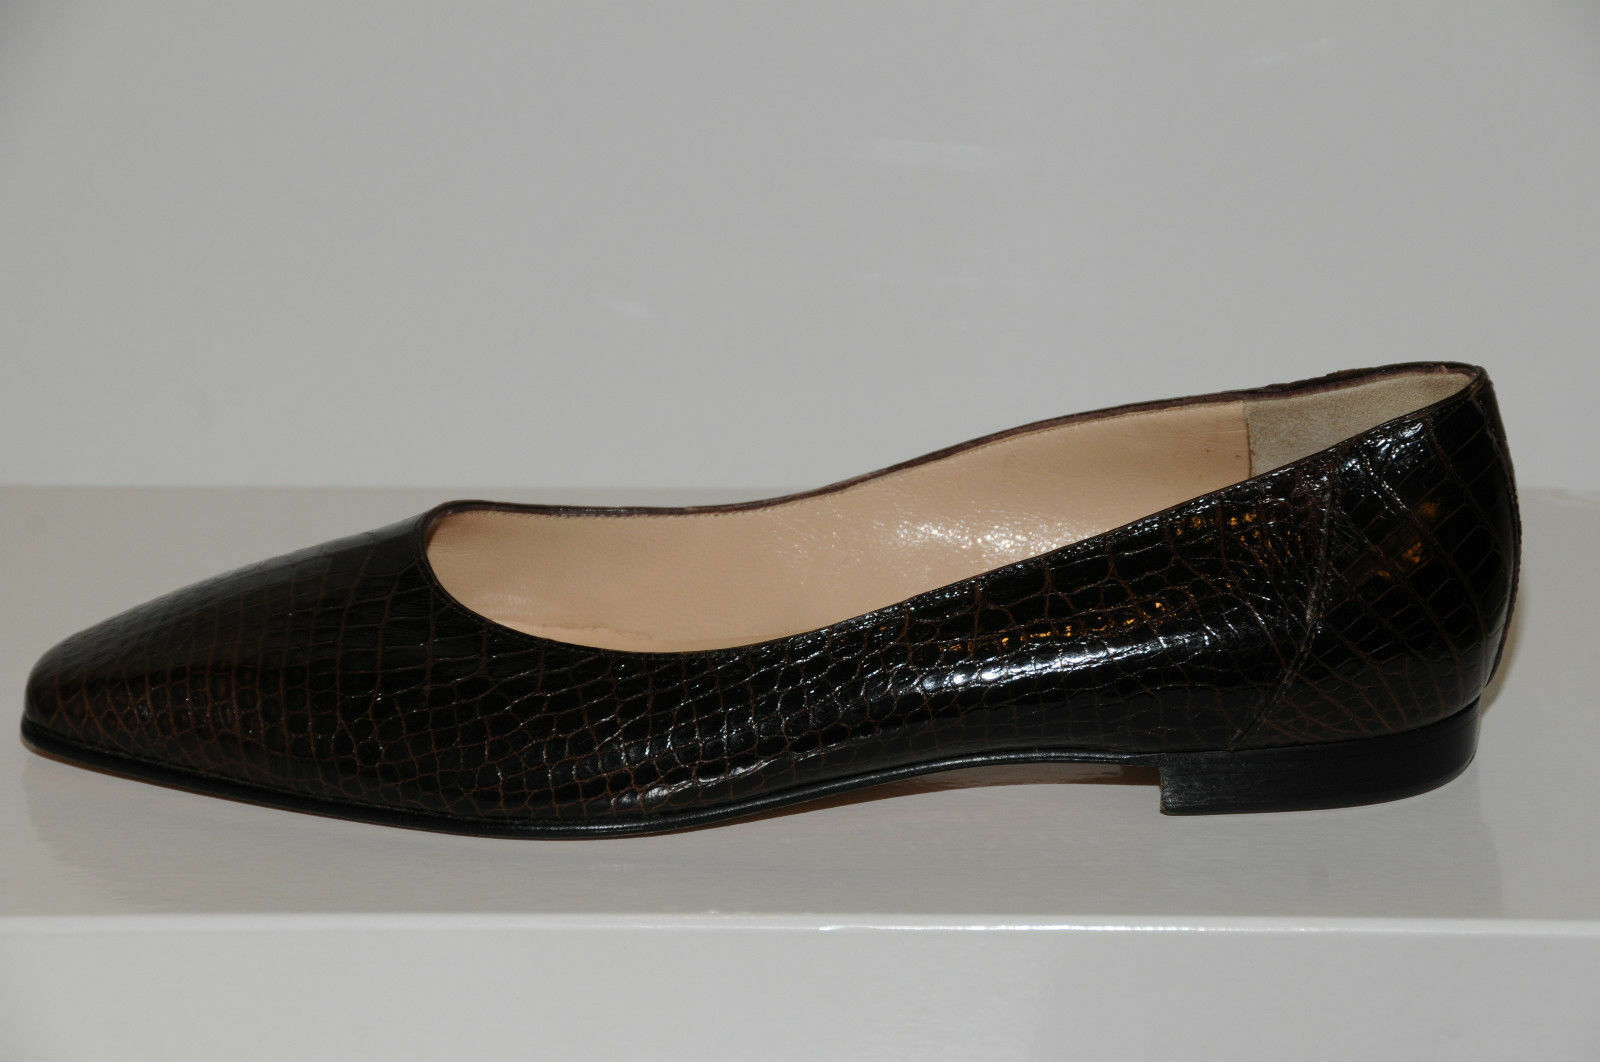 New MANOLO BLAHNIK Evangelist BROWN CROCODILE Alligator BALLET FLATS FLATS FLATS SHOES 35.5 2ea537